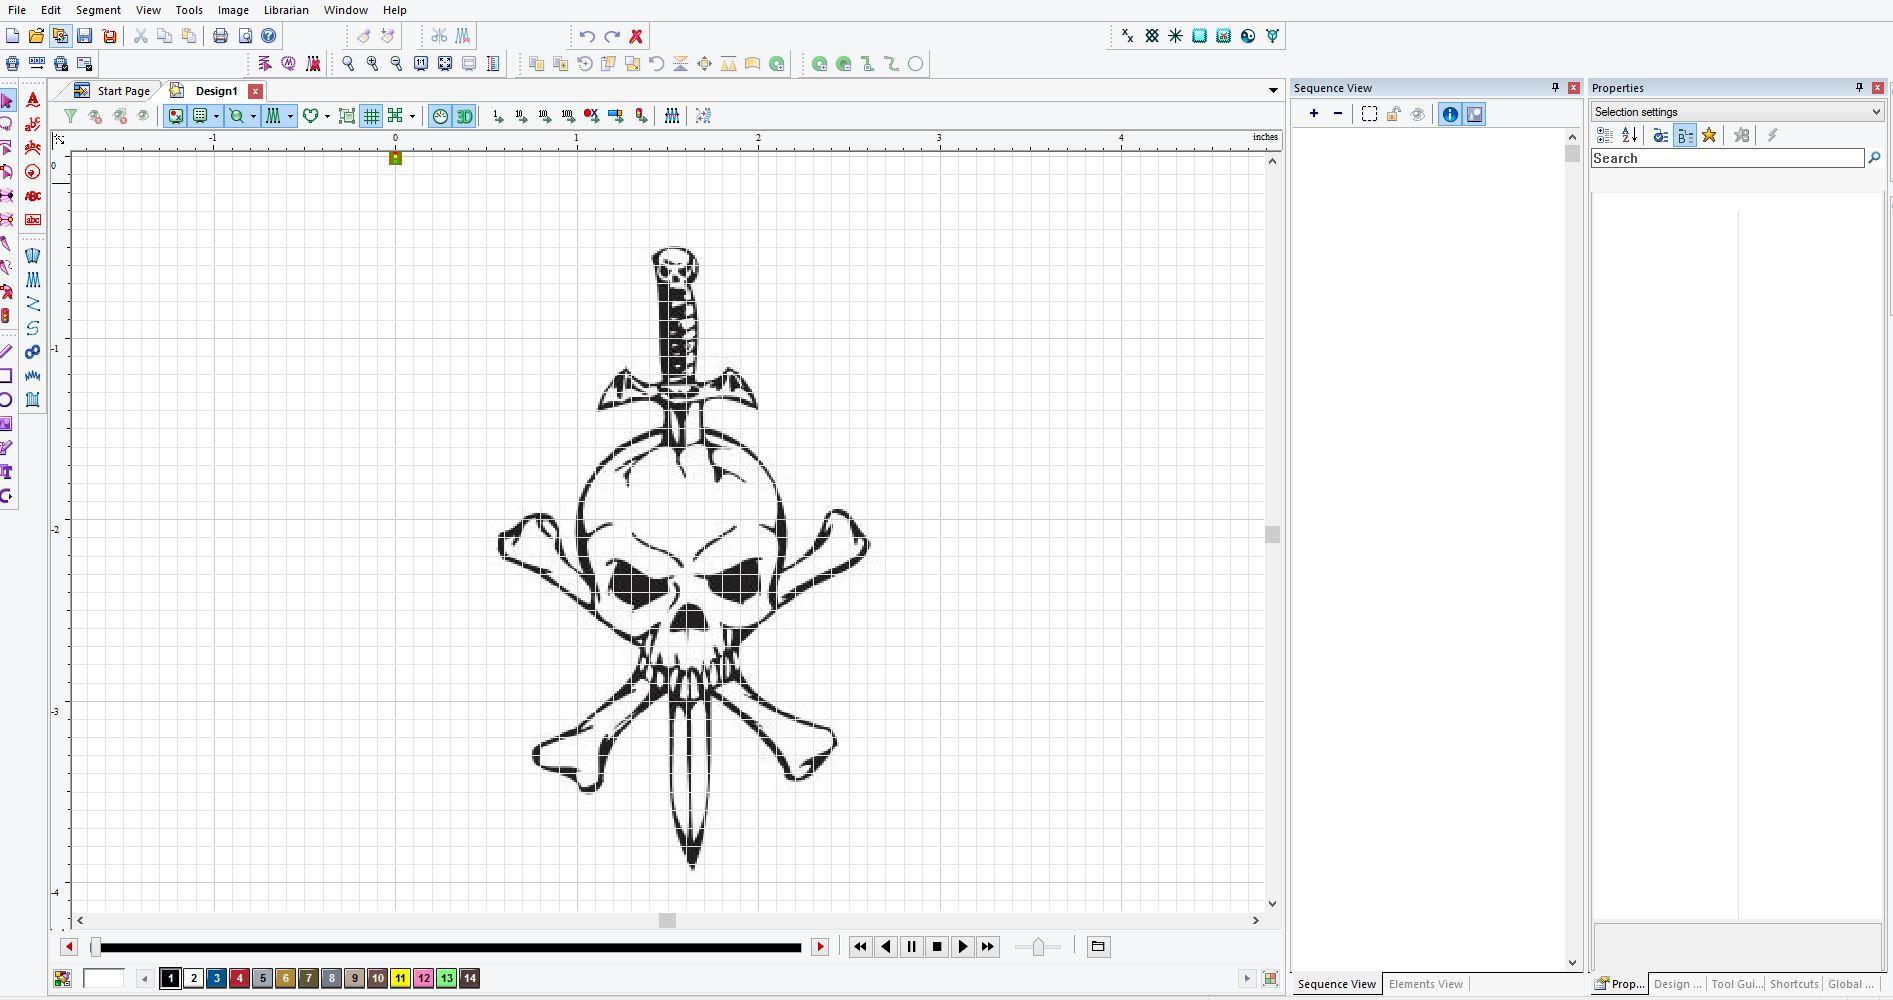 Custom Team patch image